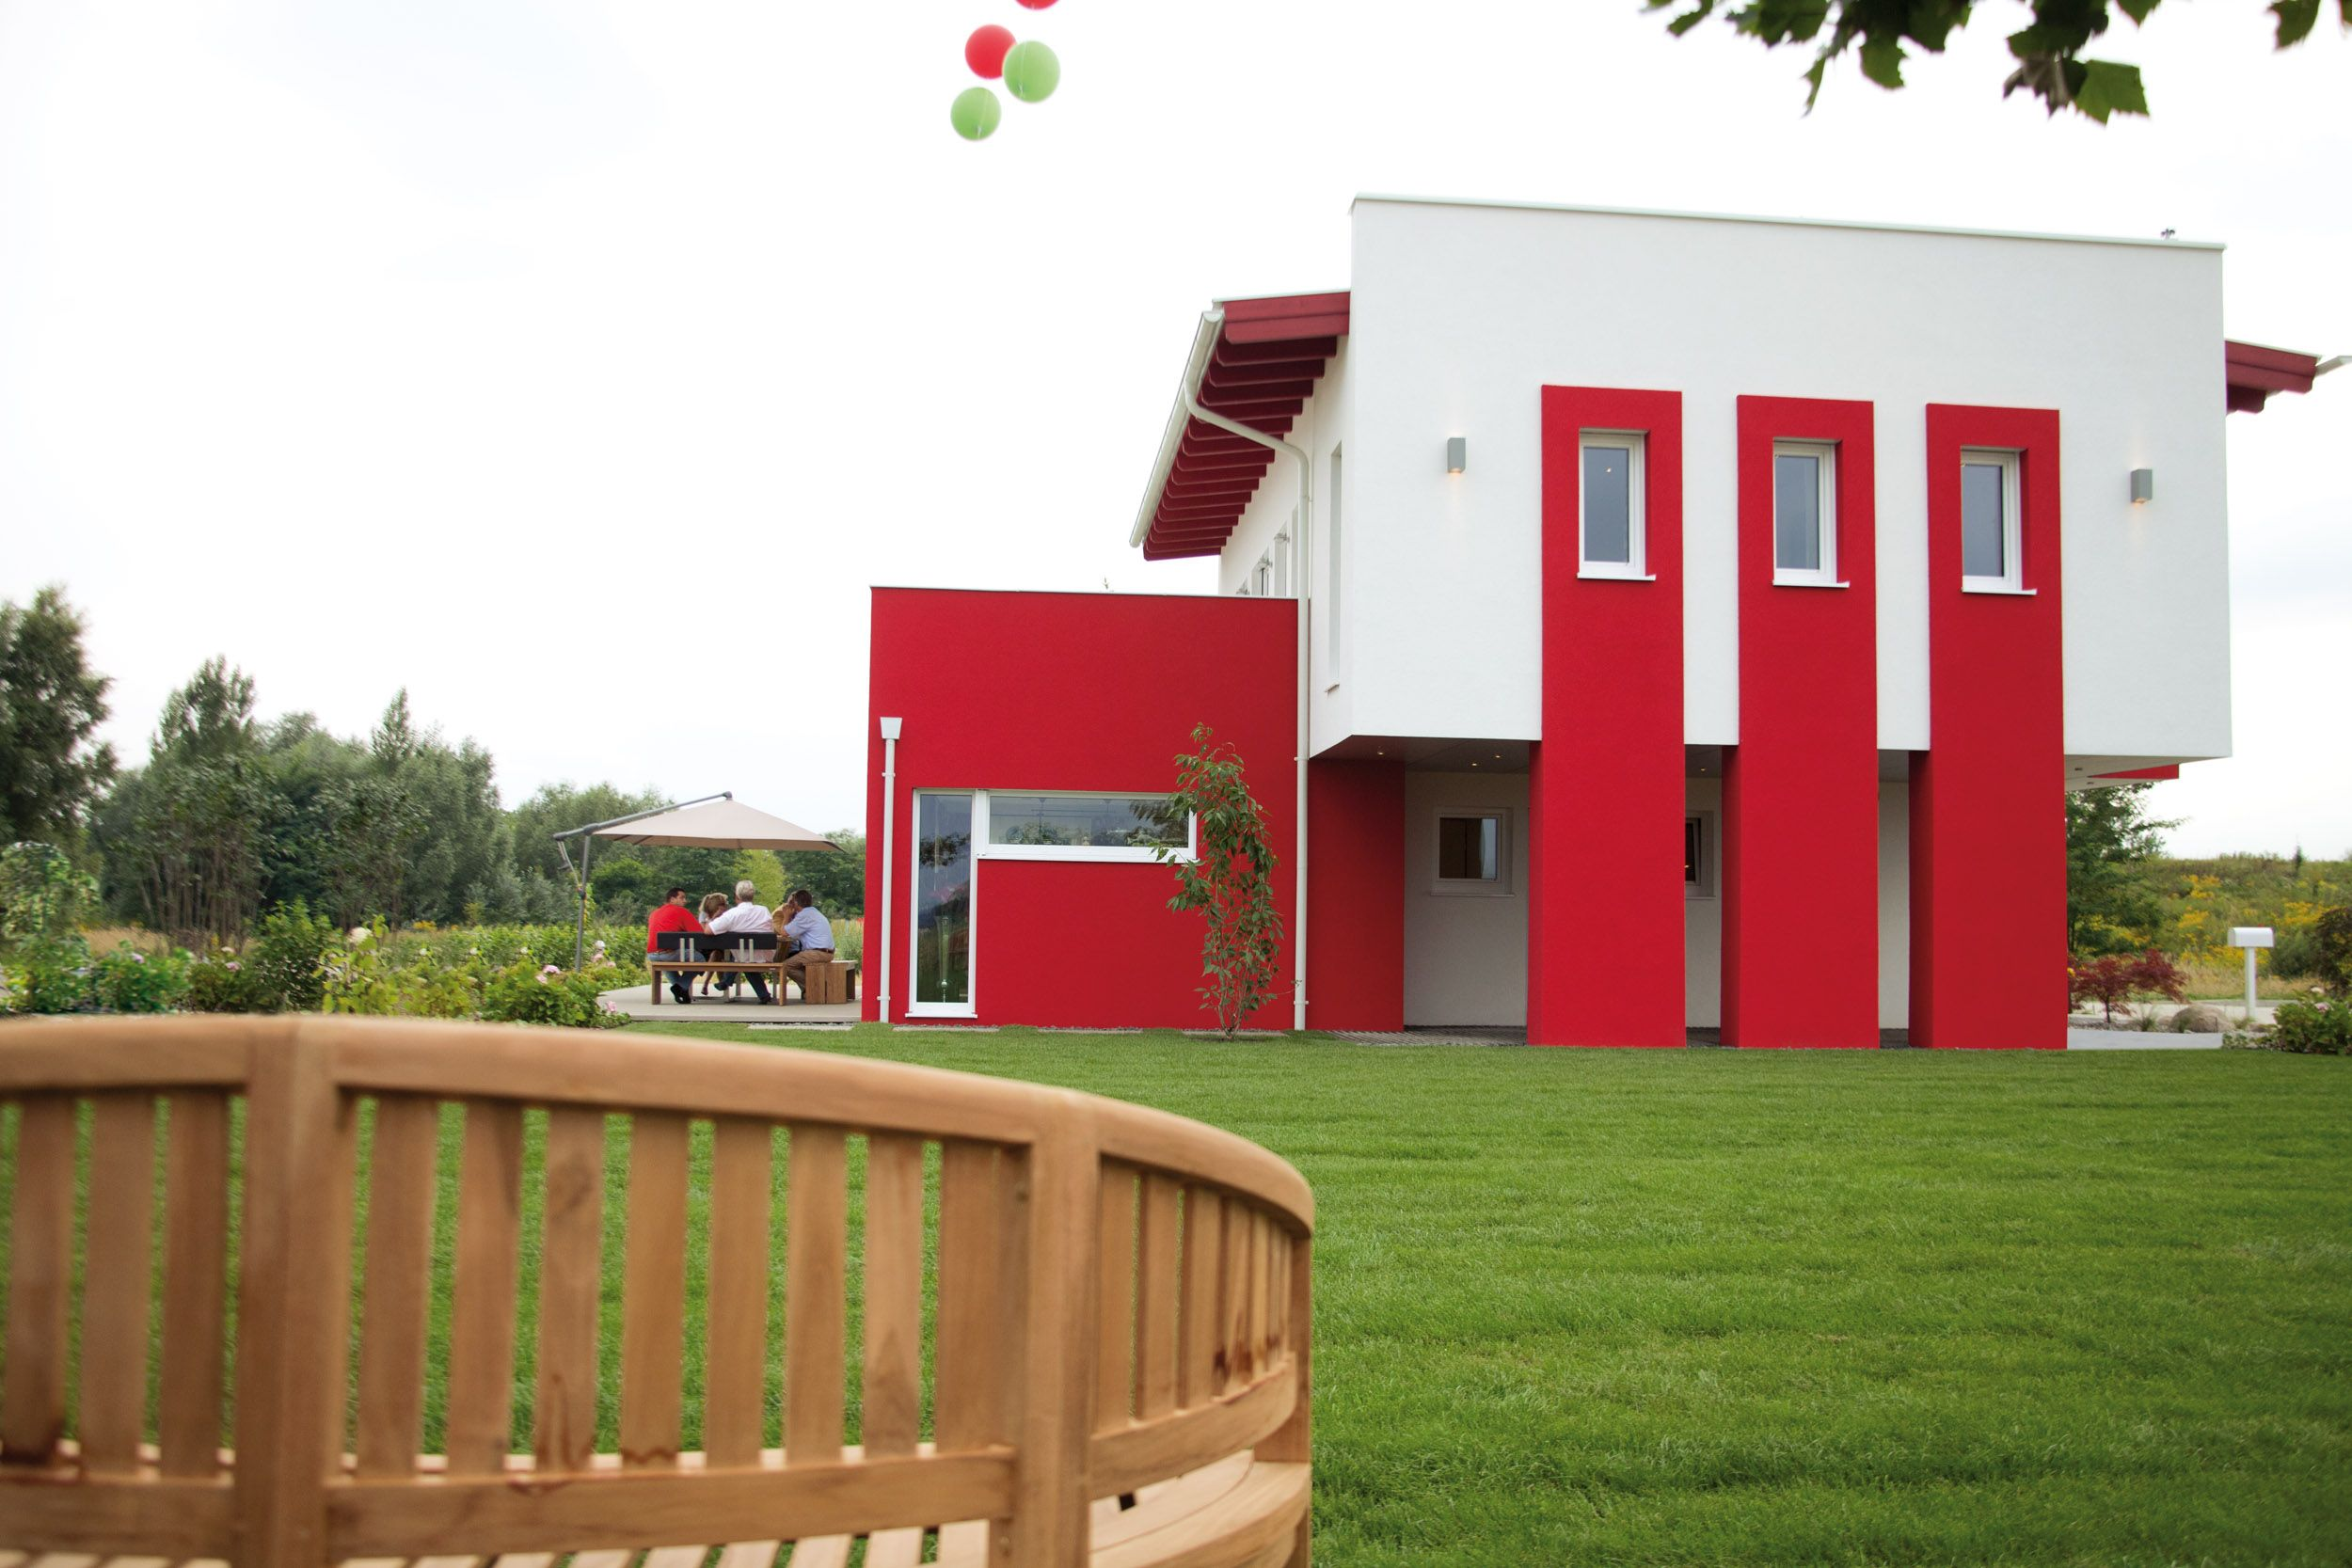 ELK Fertighaus GmbH #musterhaus #fertighaus #immobilien #eco ...